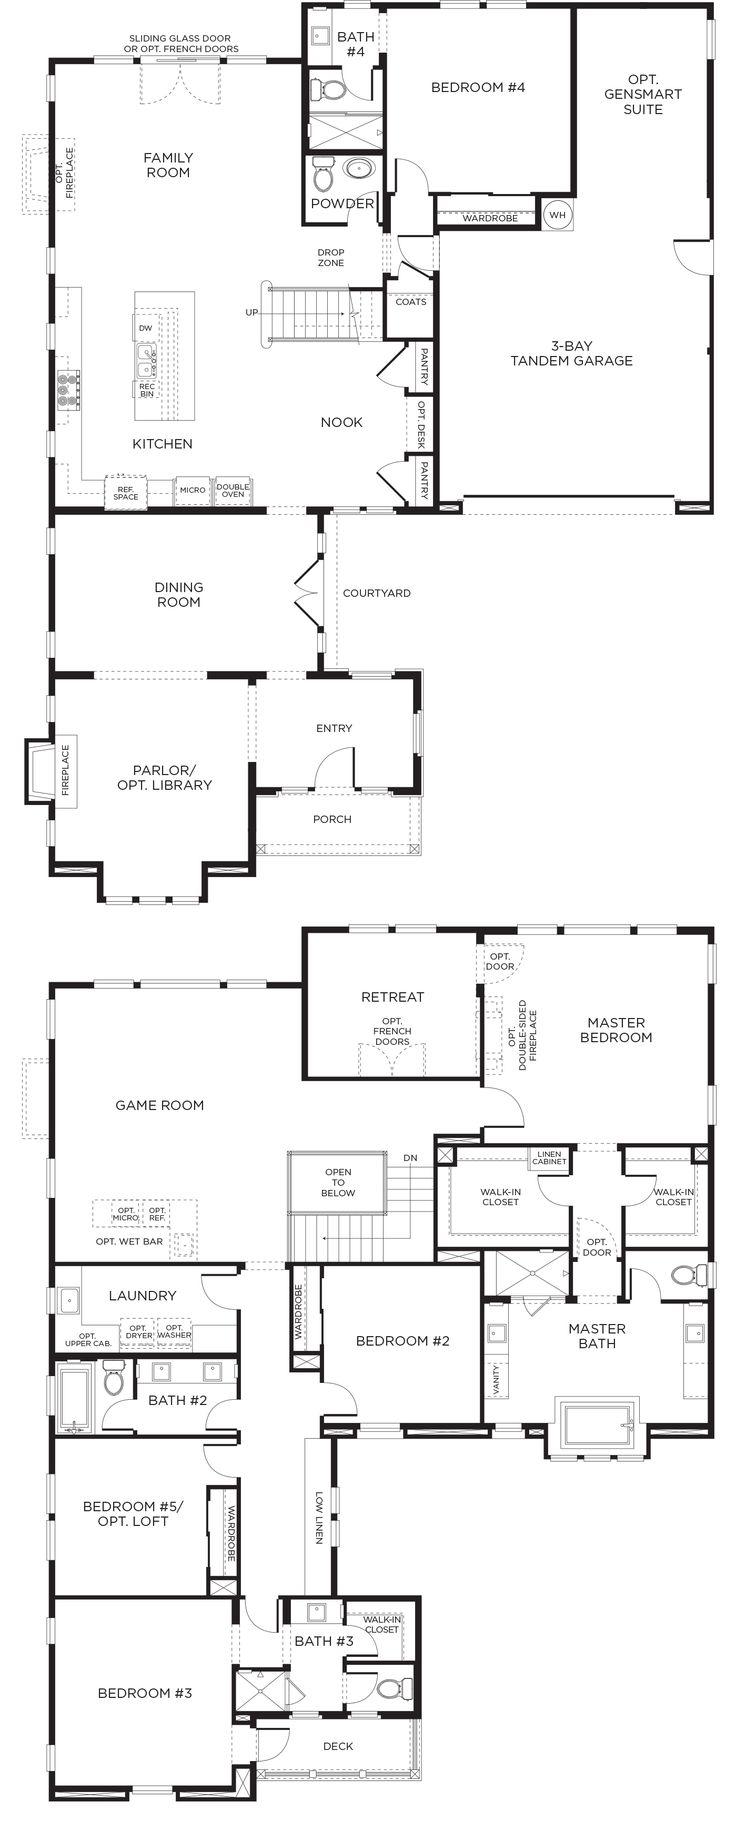 82 best plans images on pinterest house floor plans floor plans watermark plan 3c